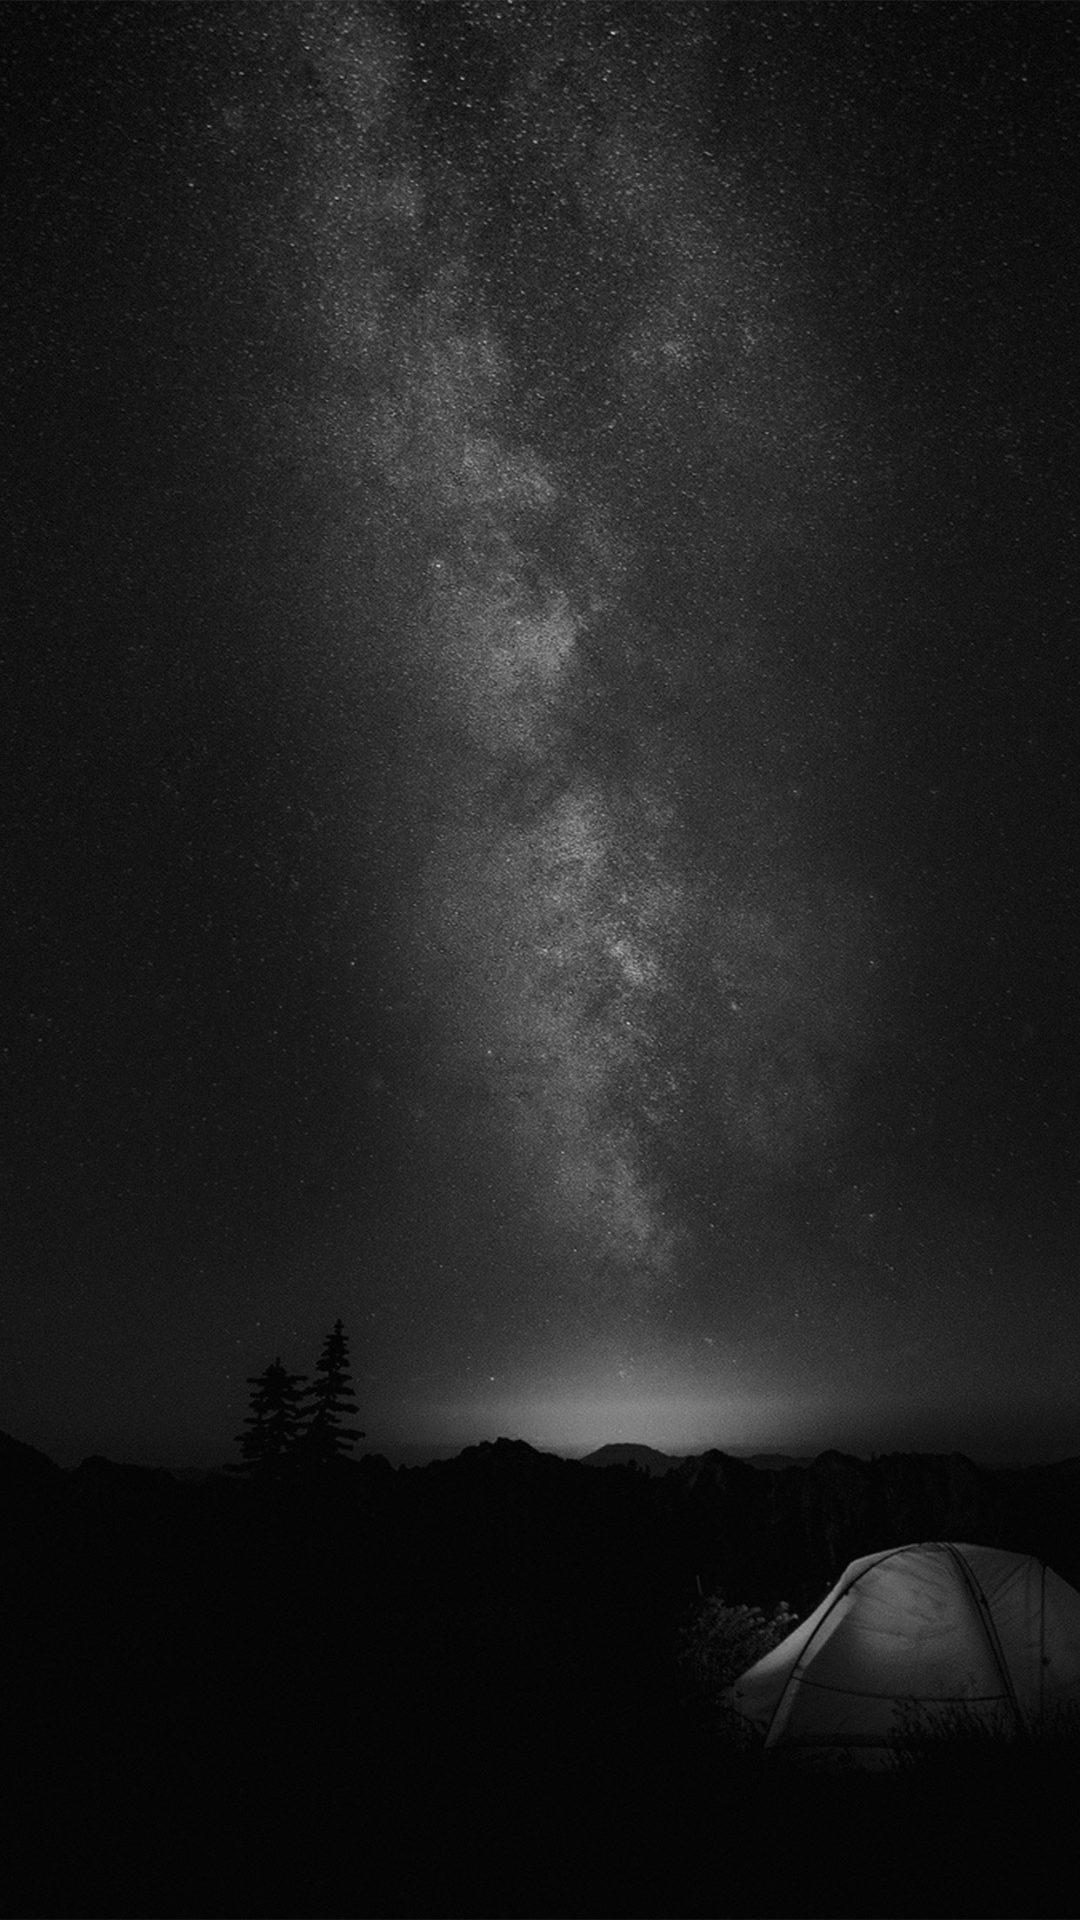 Camping Night Star Galaxy Milky Sky Dark Space Bw Dark